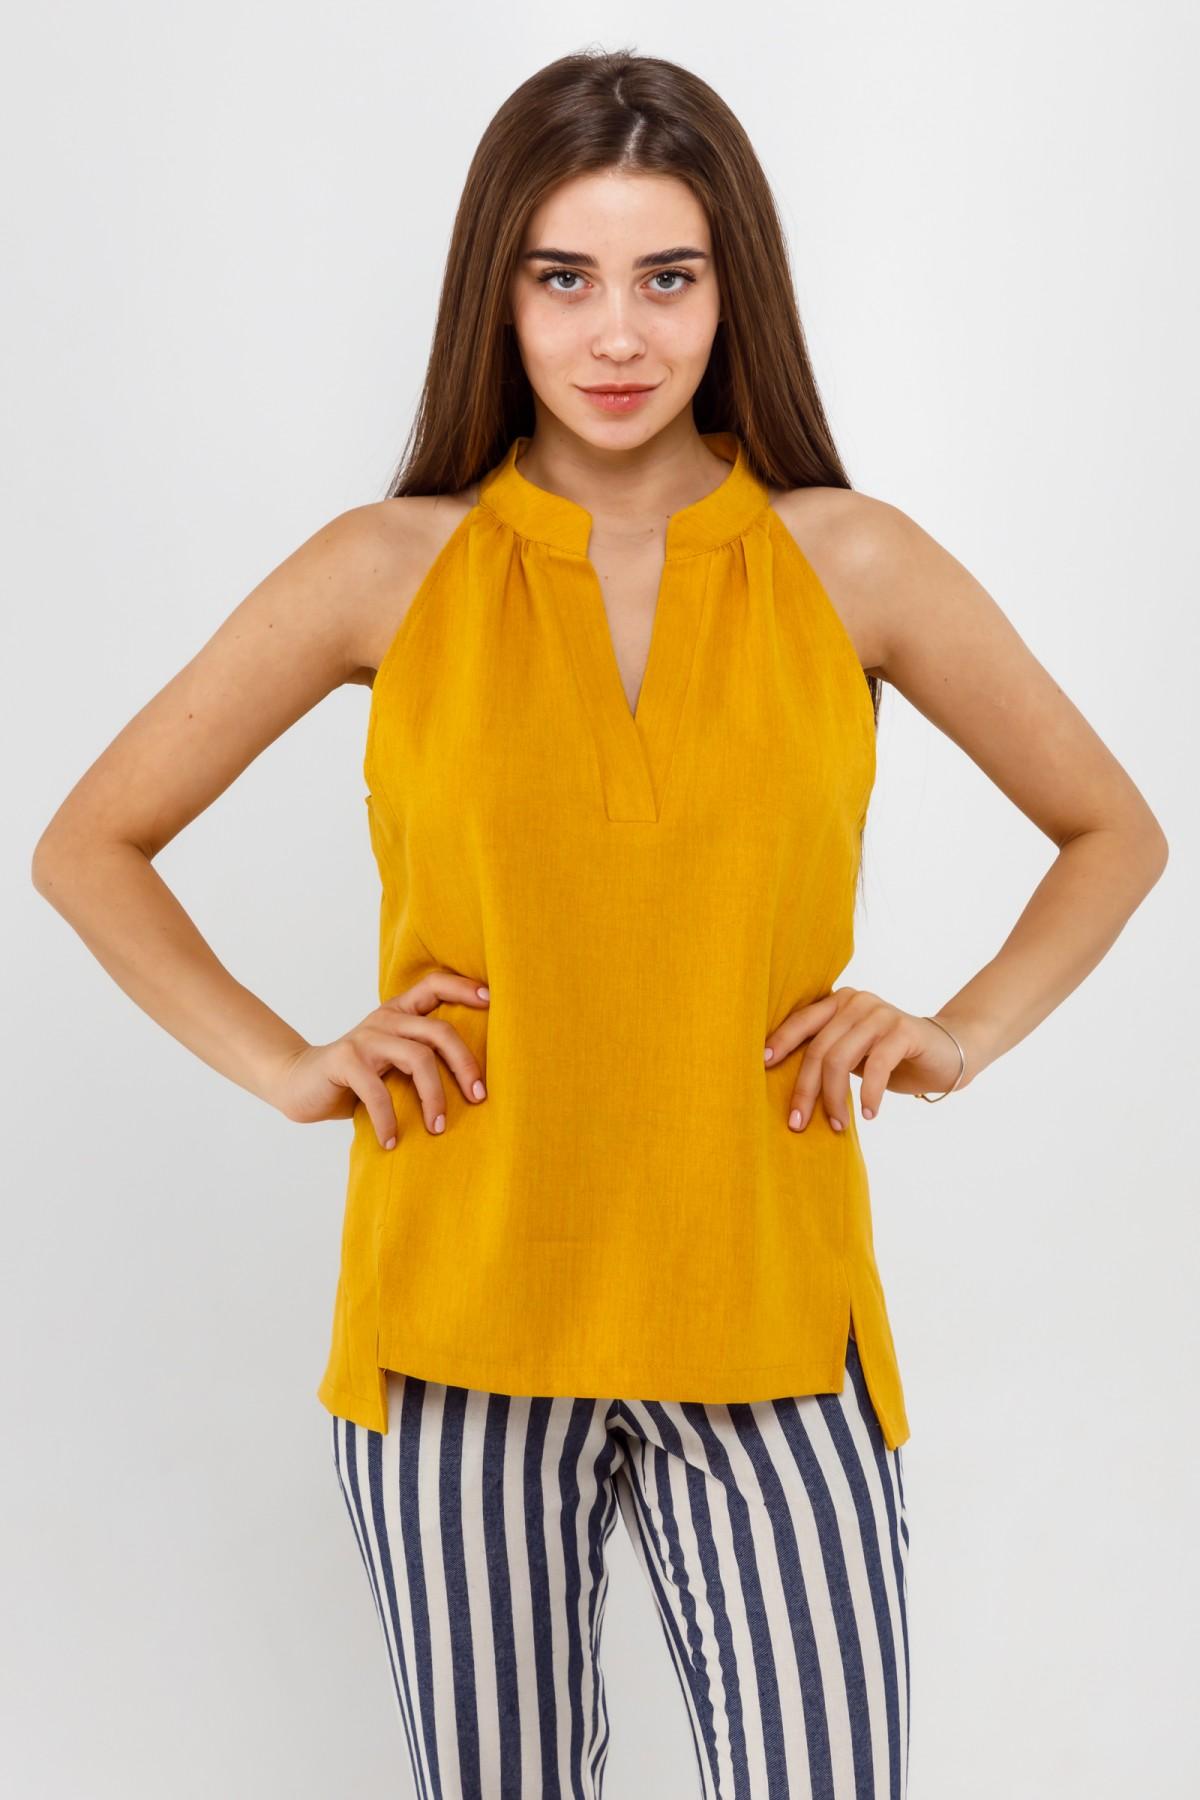 Свободно скроенная женская блуза без рукава из льна